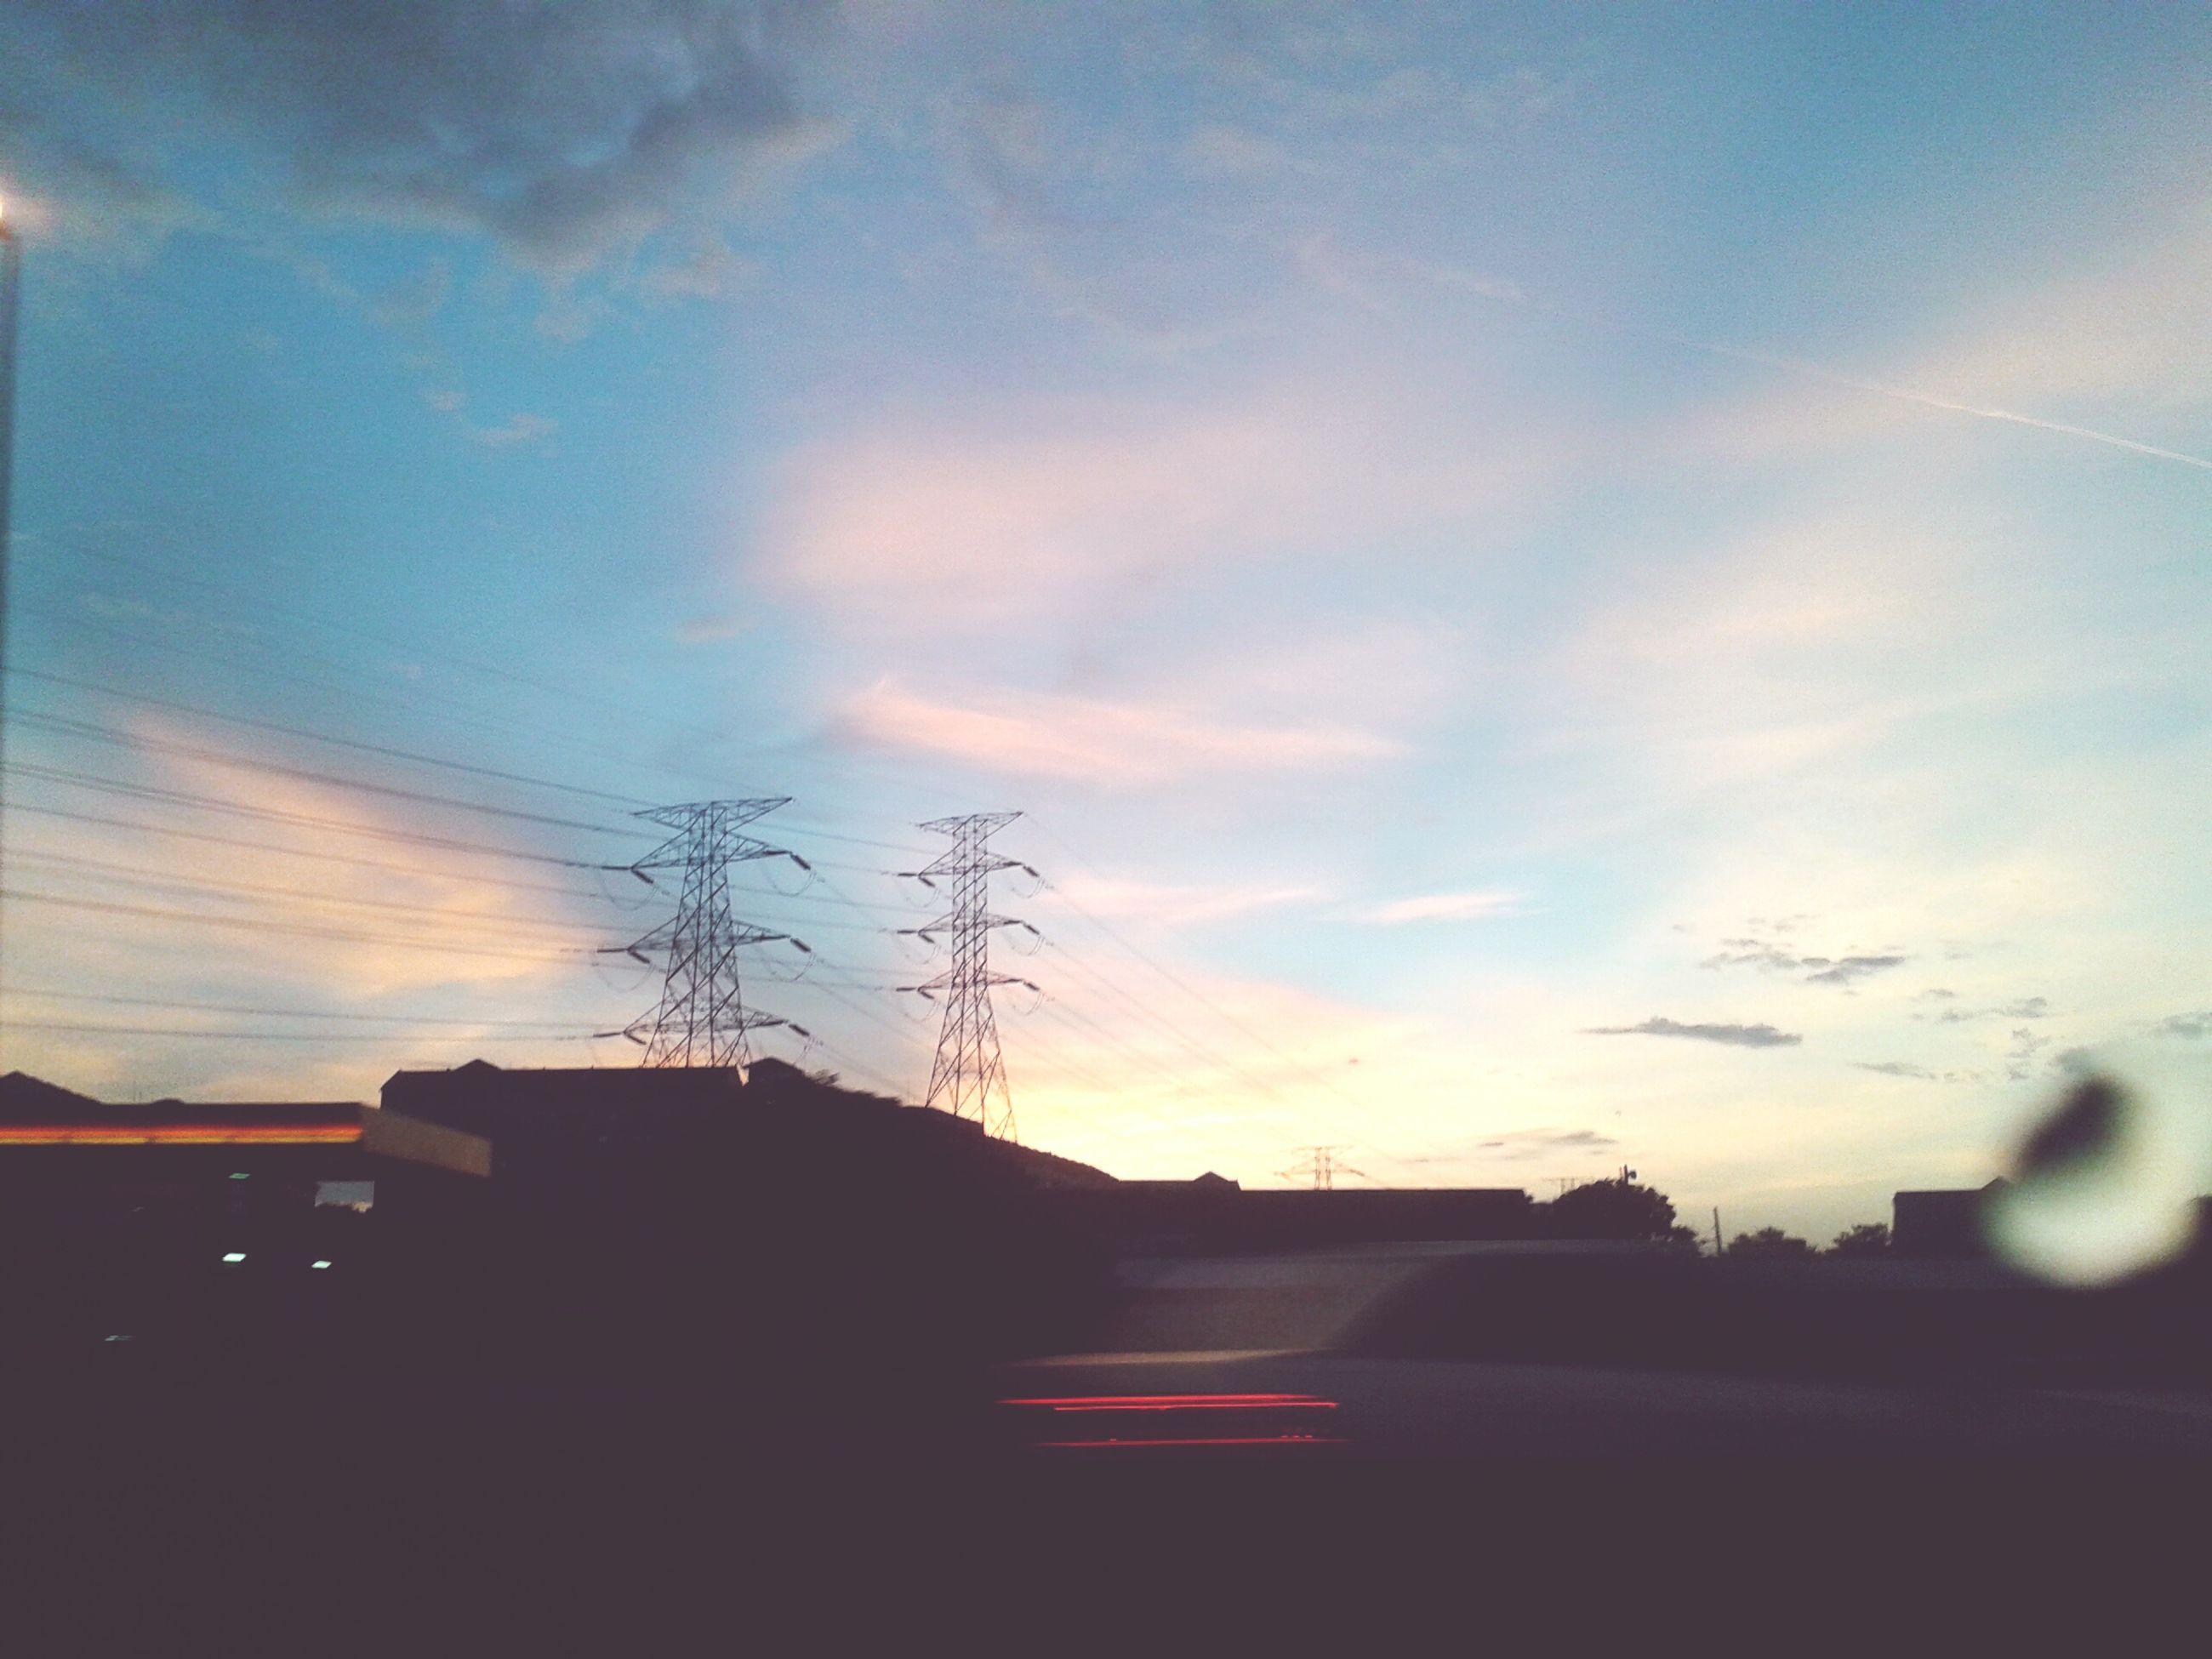 building exterior, architecture, built structure, silhouette, sky, power line, sunset, electricity pylon, low angle view, house, electricity, cloud - sky, cable, cloud, residential structure, dusk, power supply, building, connection, residential building